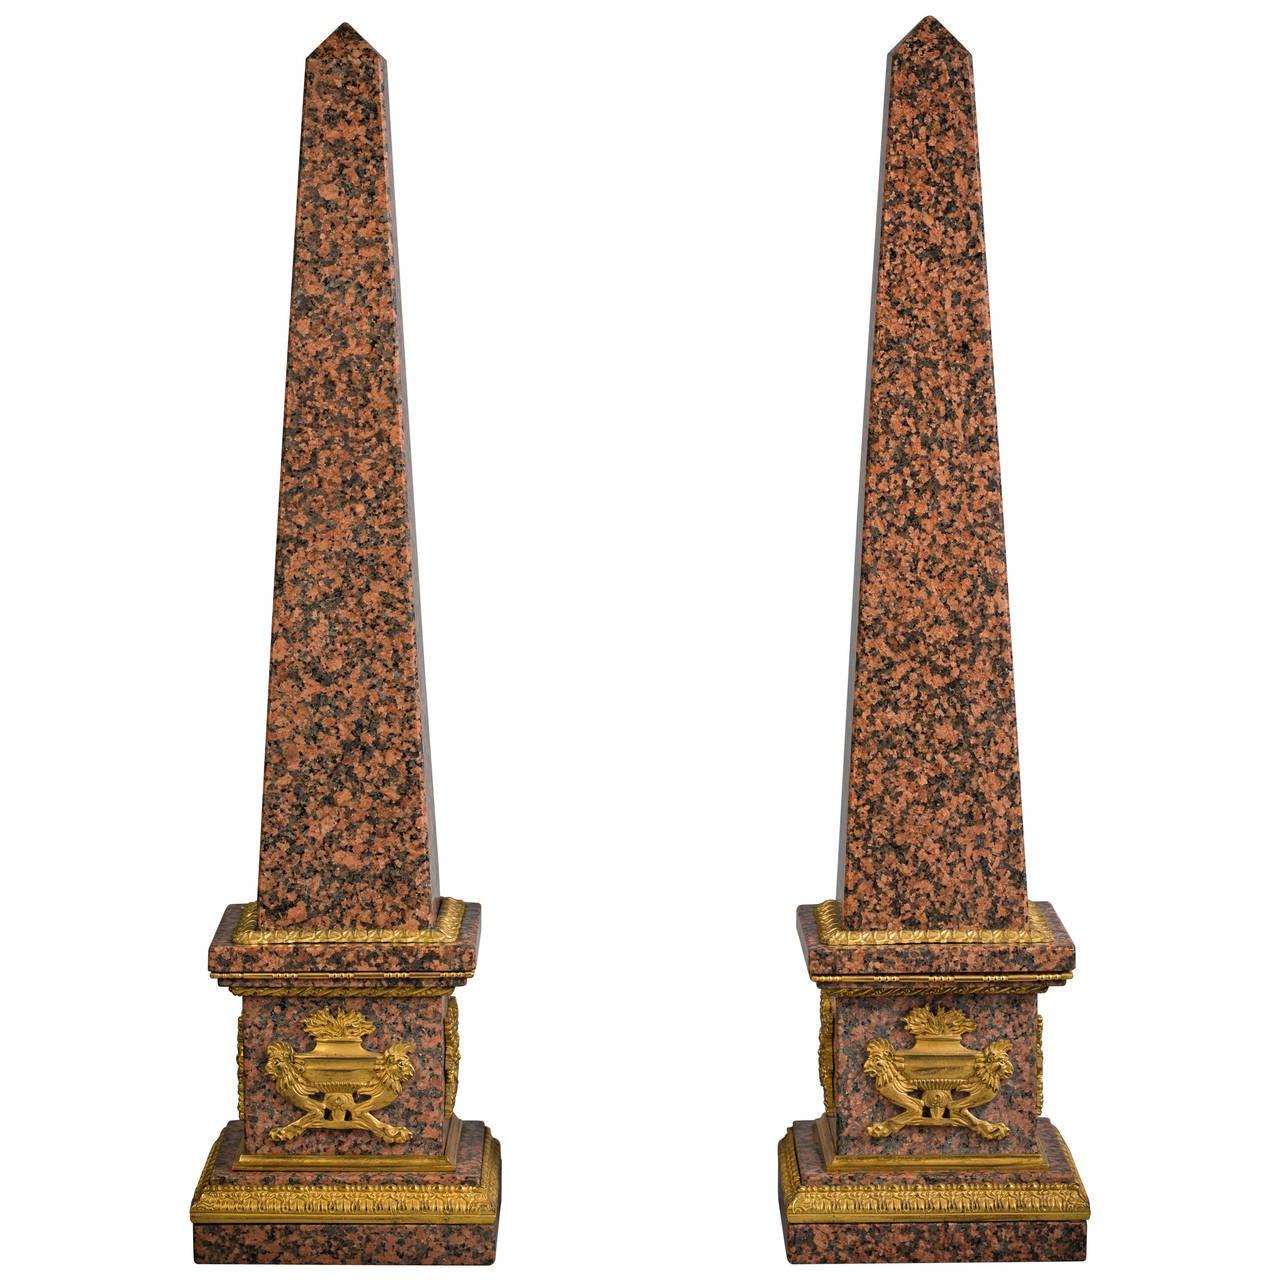 Pair of Granite and Bronze Obelisks, Late 19th Century